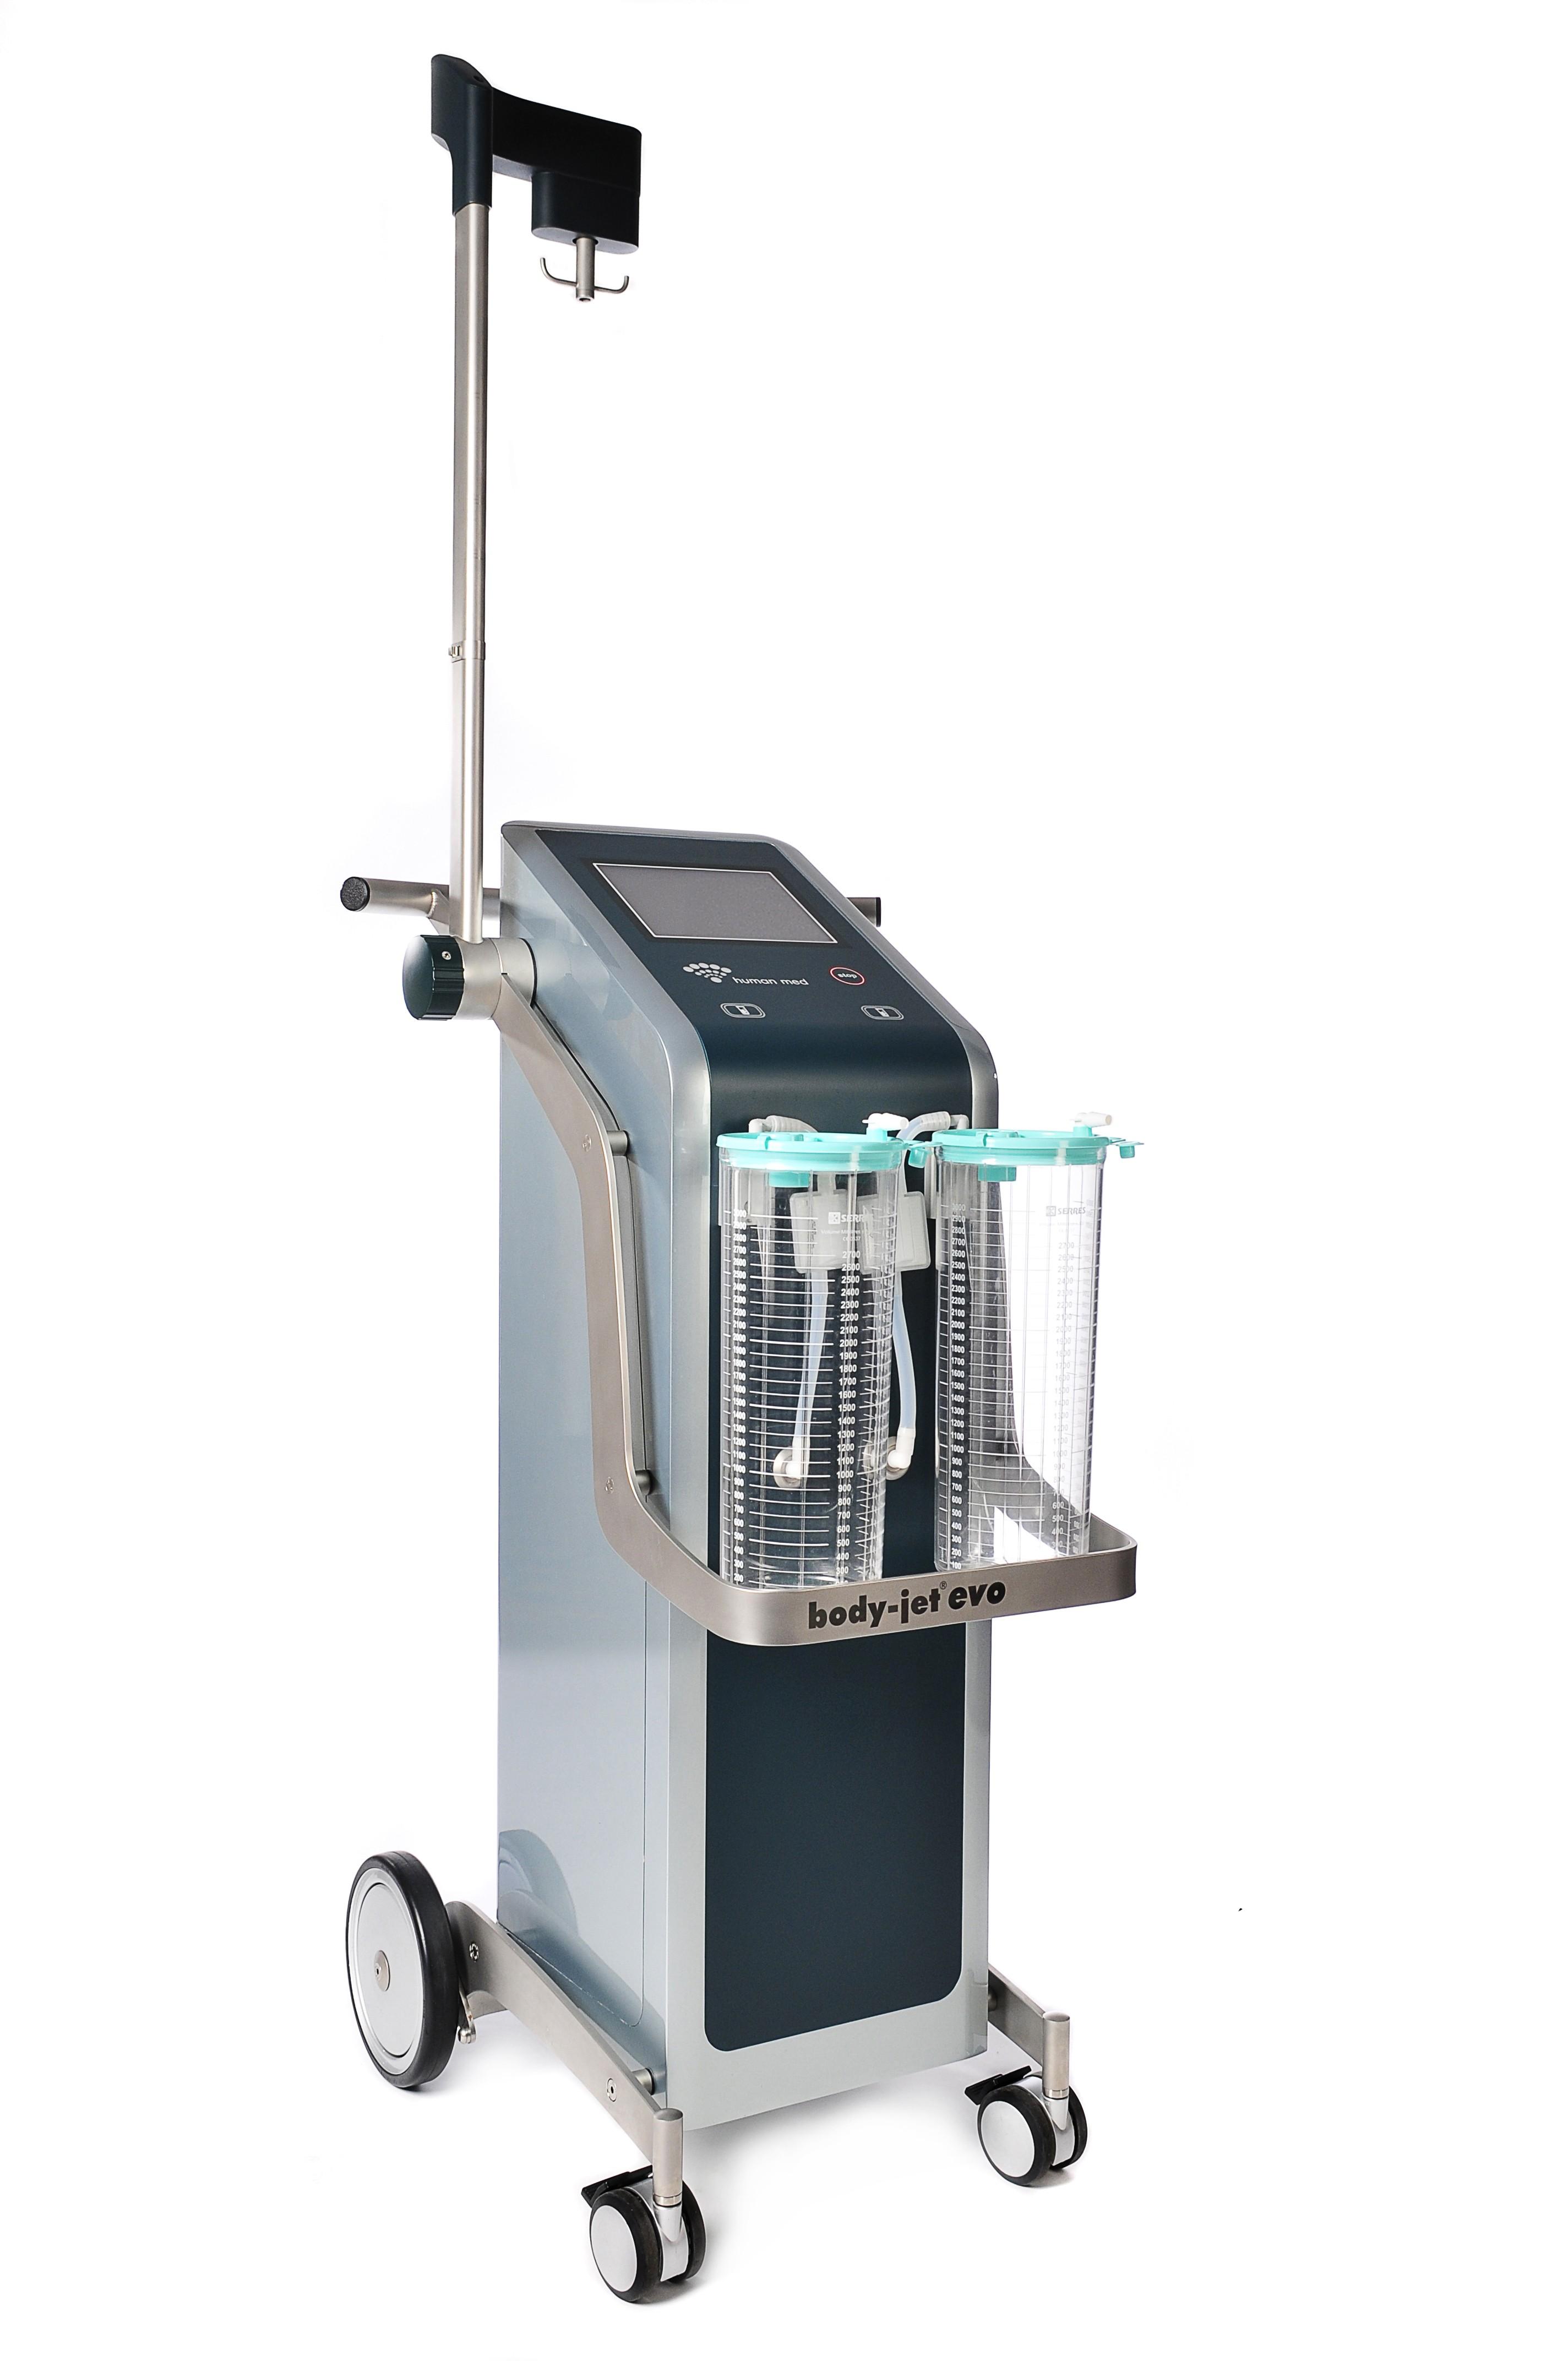 body jet evo liposukcny stroj prenos tuku zmensenie zadku mensie stehna liposukcia brucha